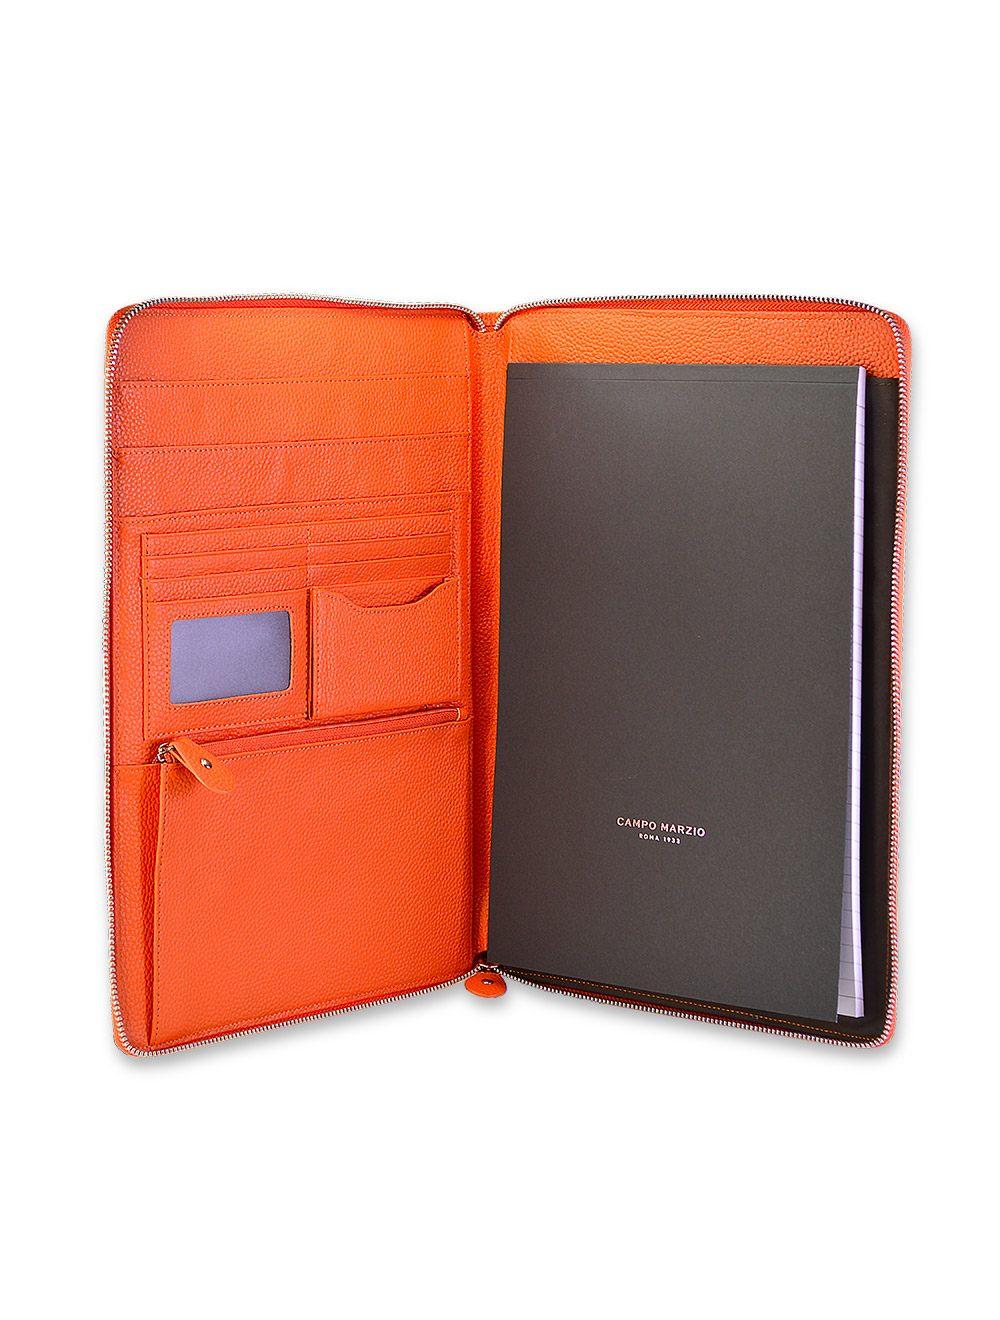 Portfolio Zip A4 - Mandarin